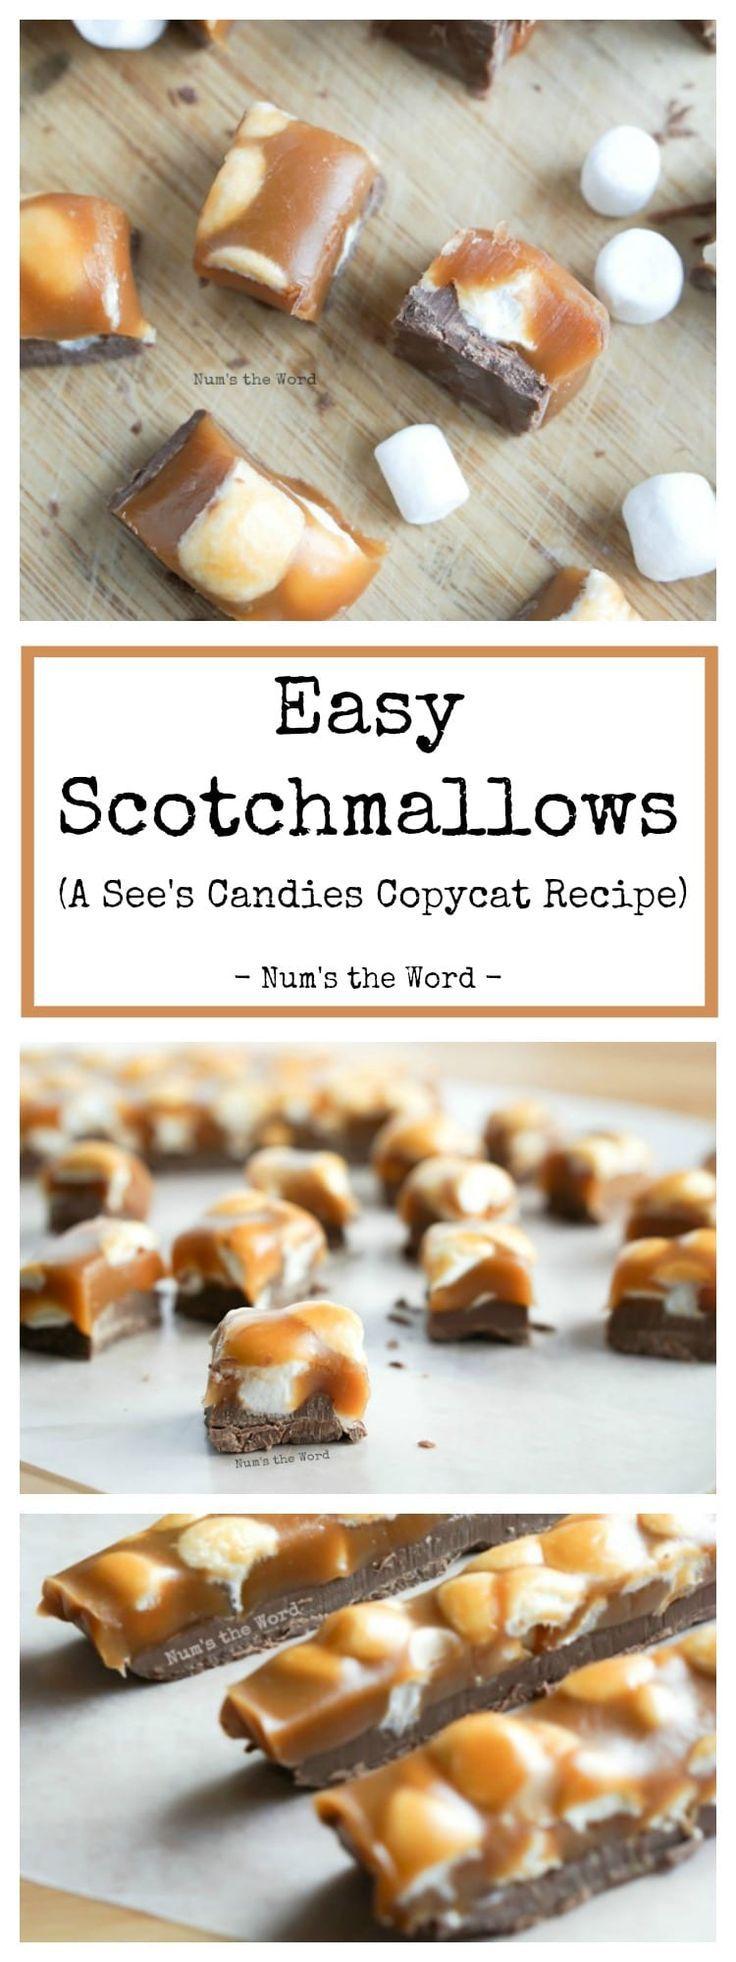 Easy Scotchmallows - NumsTheWord Easy Scotchmallows - NumsTheWord , Easy Scotchmallows - NumsTheWord...  ,